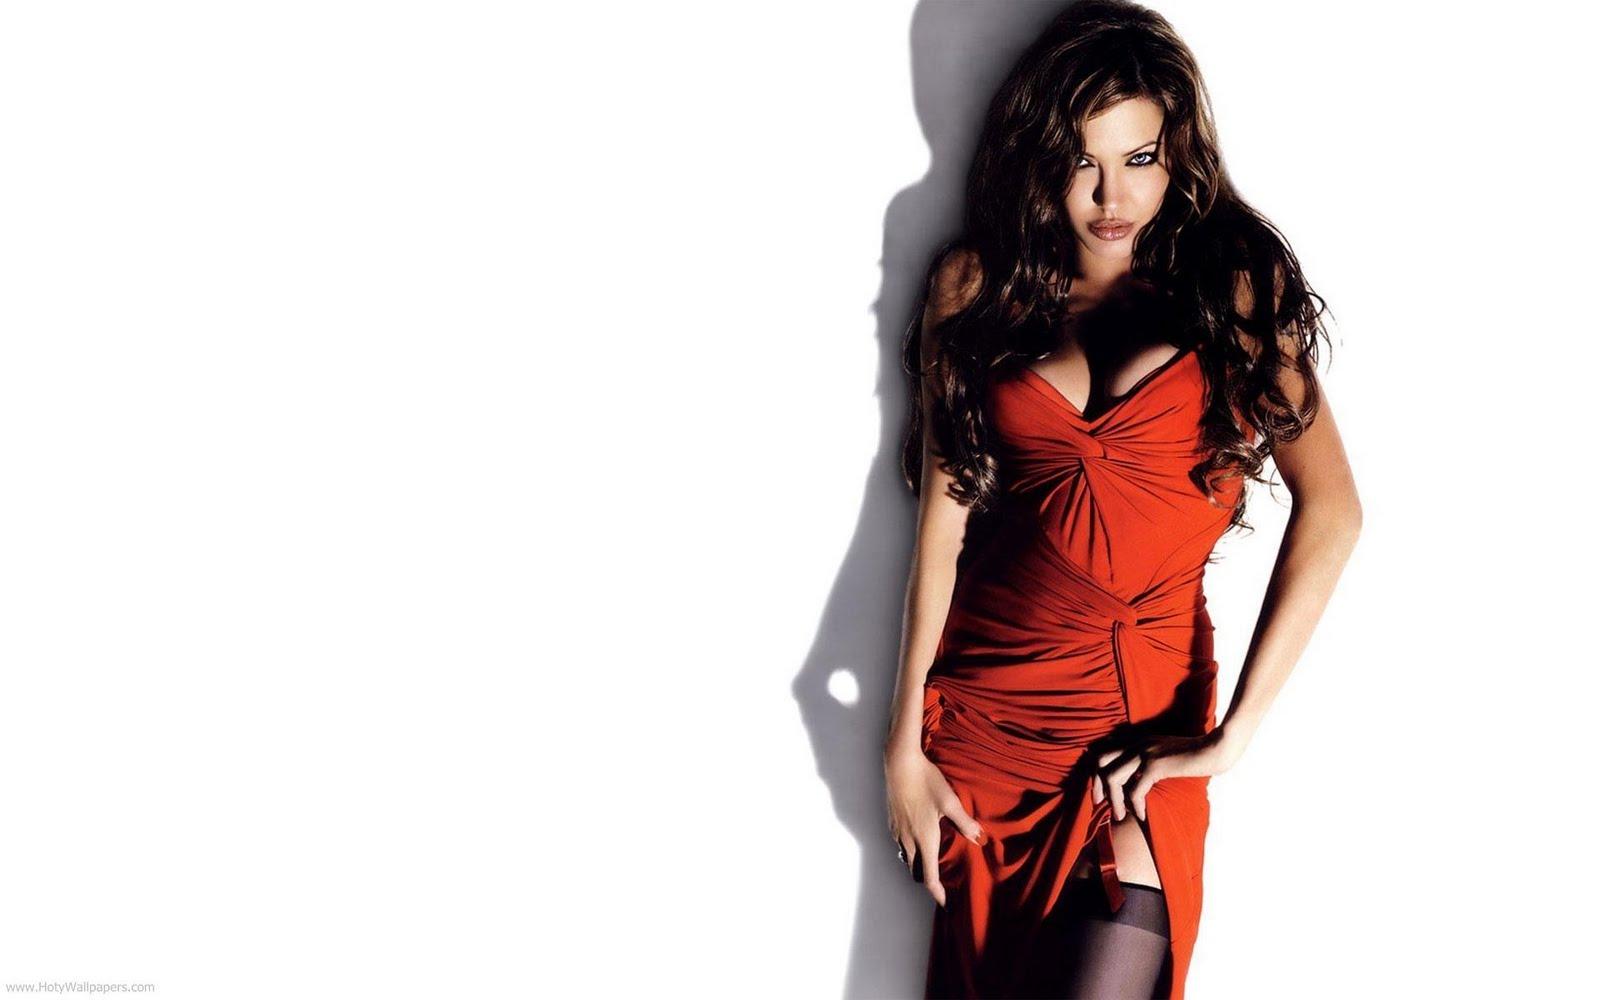 http://3.bp.blogspot.com/-g4Y96zTrgKs/TxQnhxUlWlI/AAAAAAAACTg/UwDebL8swkI/s1600/angelina_jolie_wallpaper-in-red-1920x1200.jpg